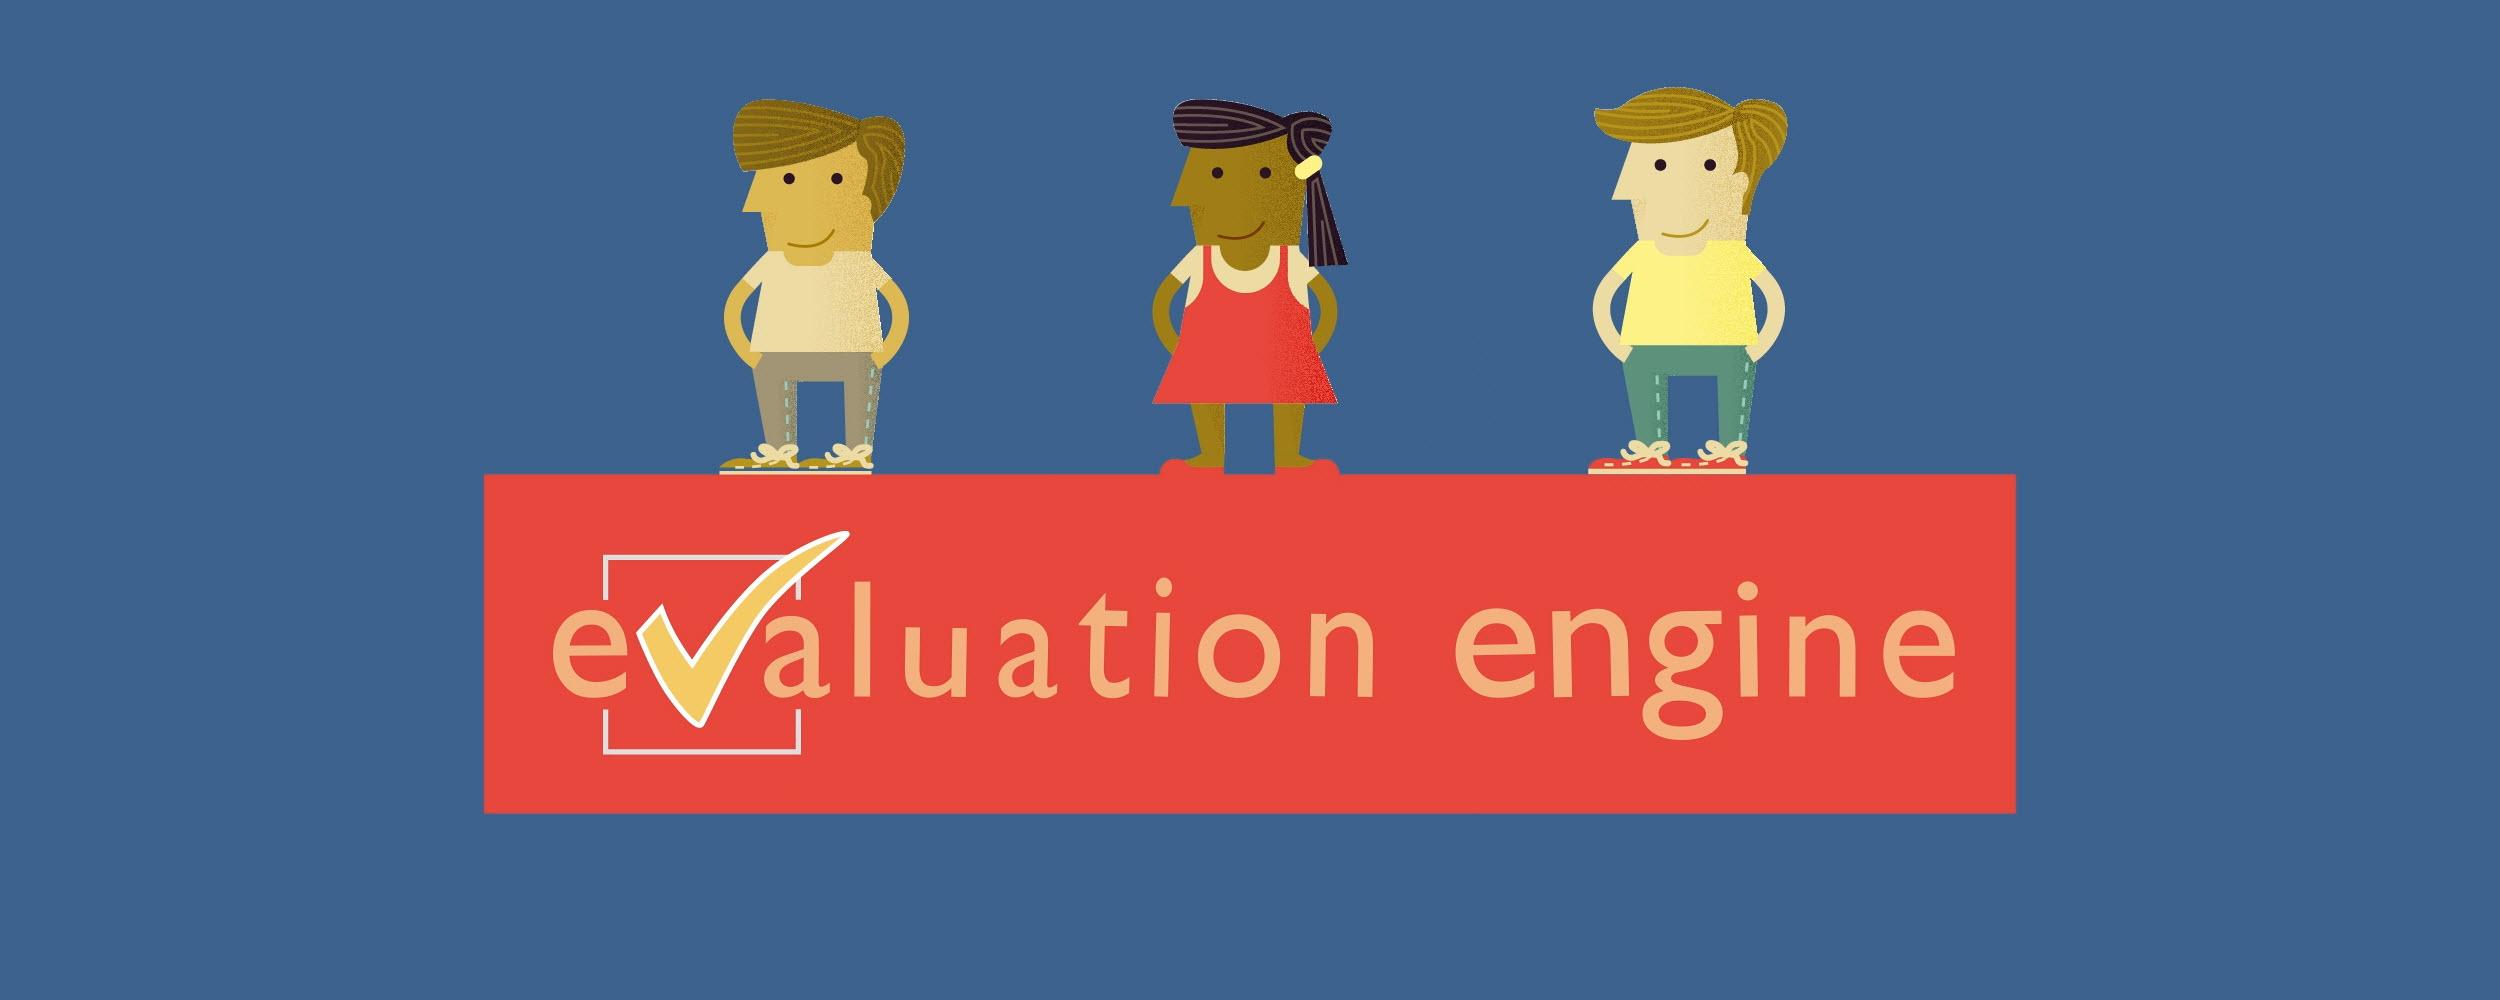 Evaluation Engine Rti